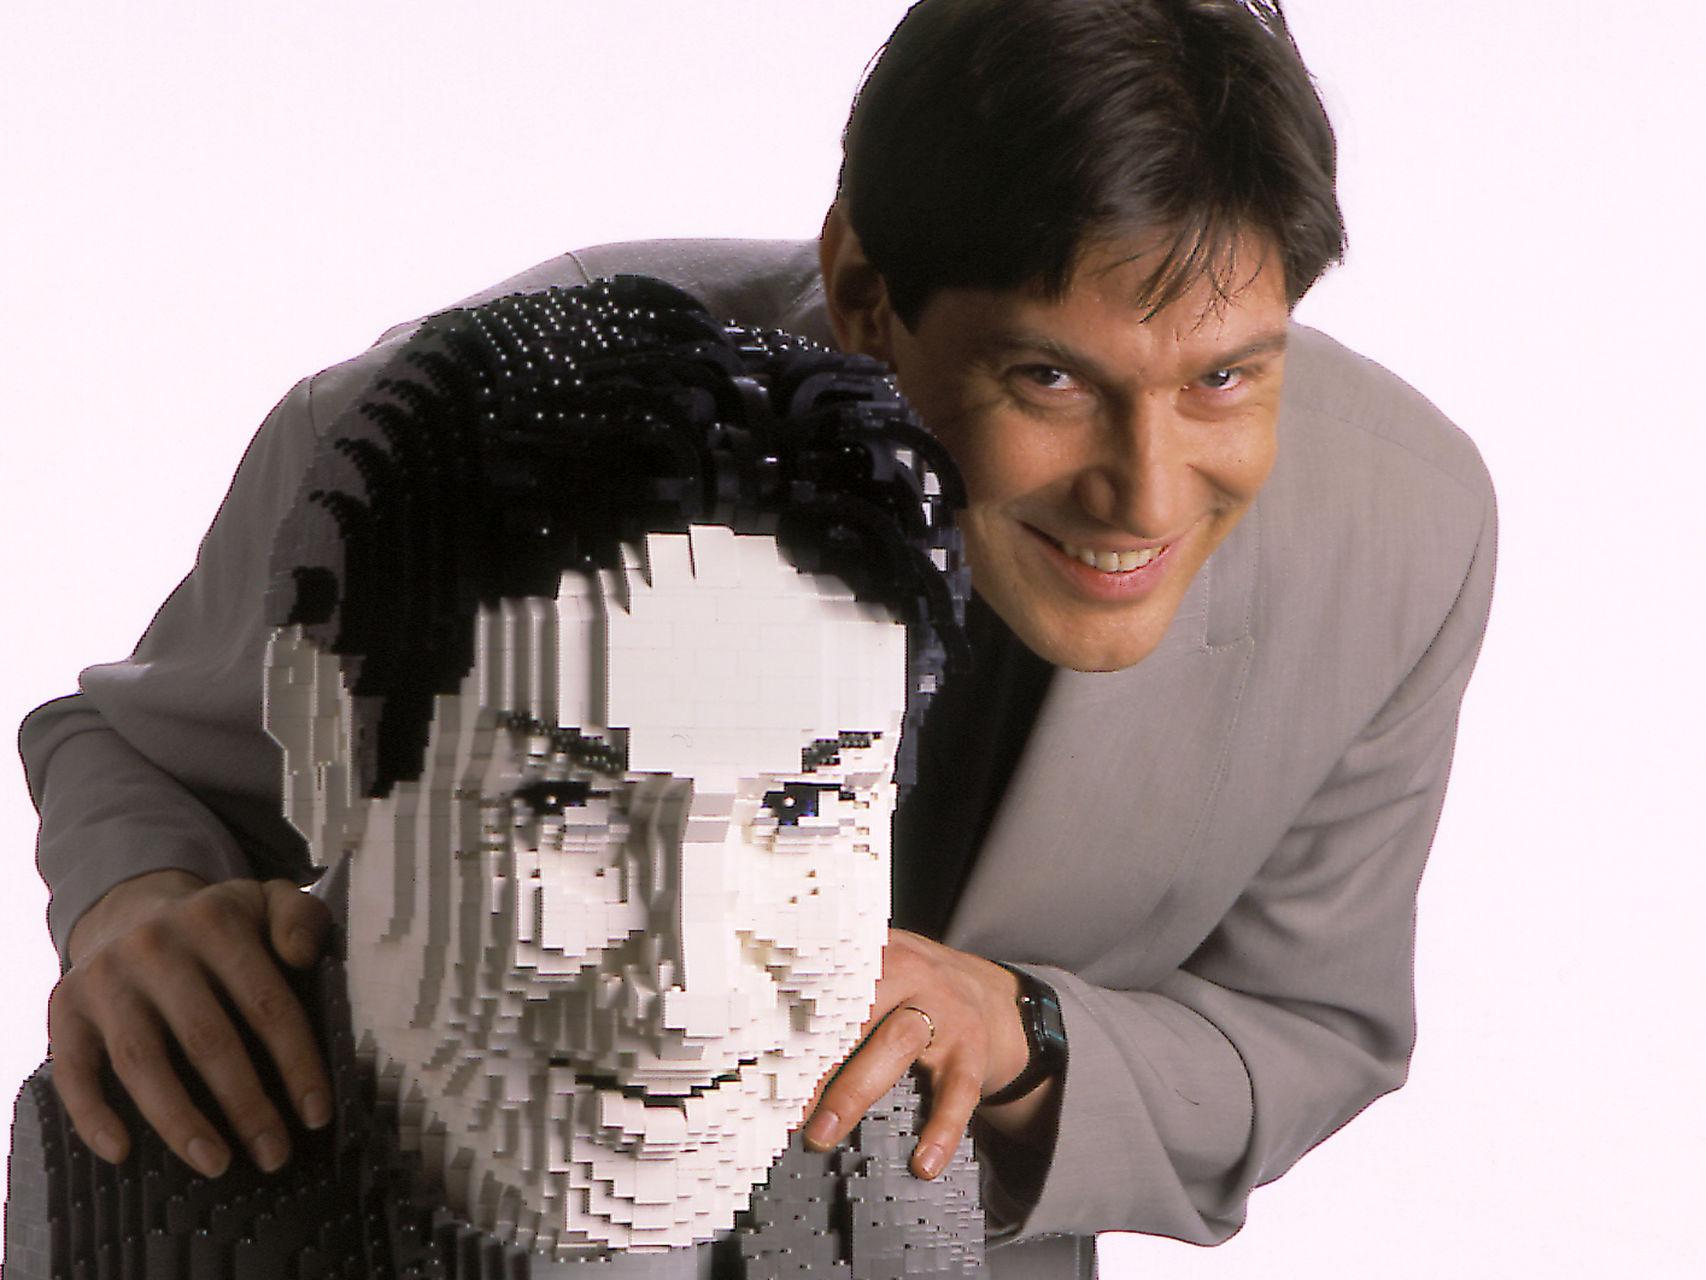 Dirk-Denoyelle-autorretrato-Lego_114748949_3281079_1706x1280